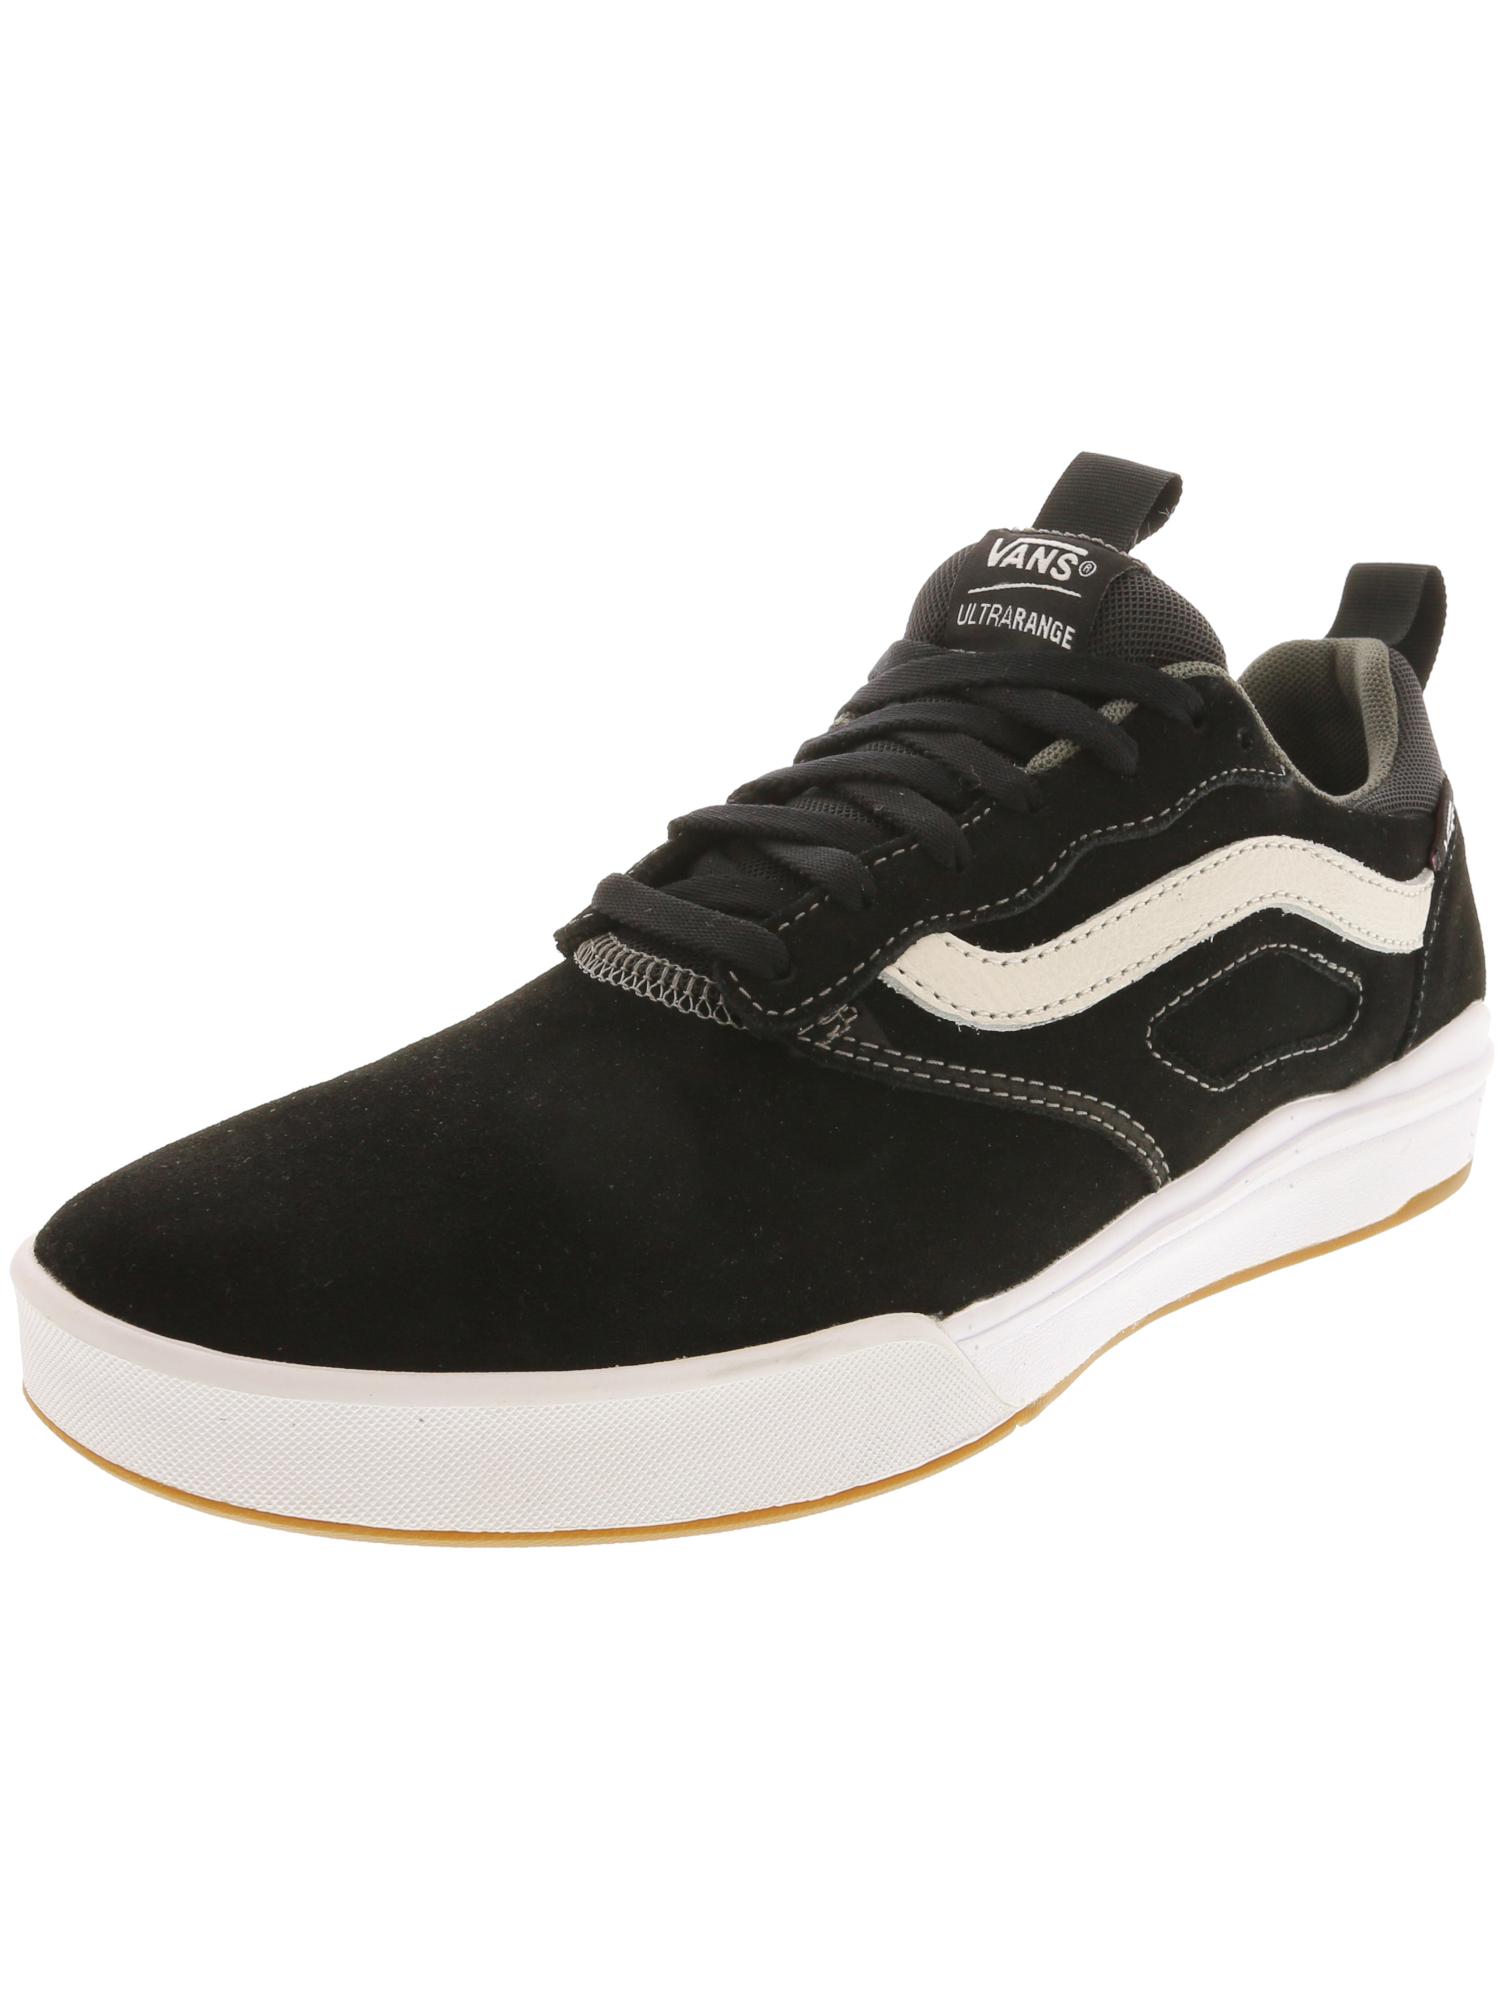 cbe17cf7c72 Vans Men s Ultra Range Pro Bl Ankle-High Suede Skateboarding Shoe